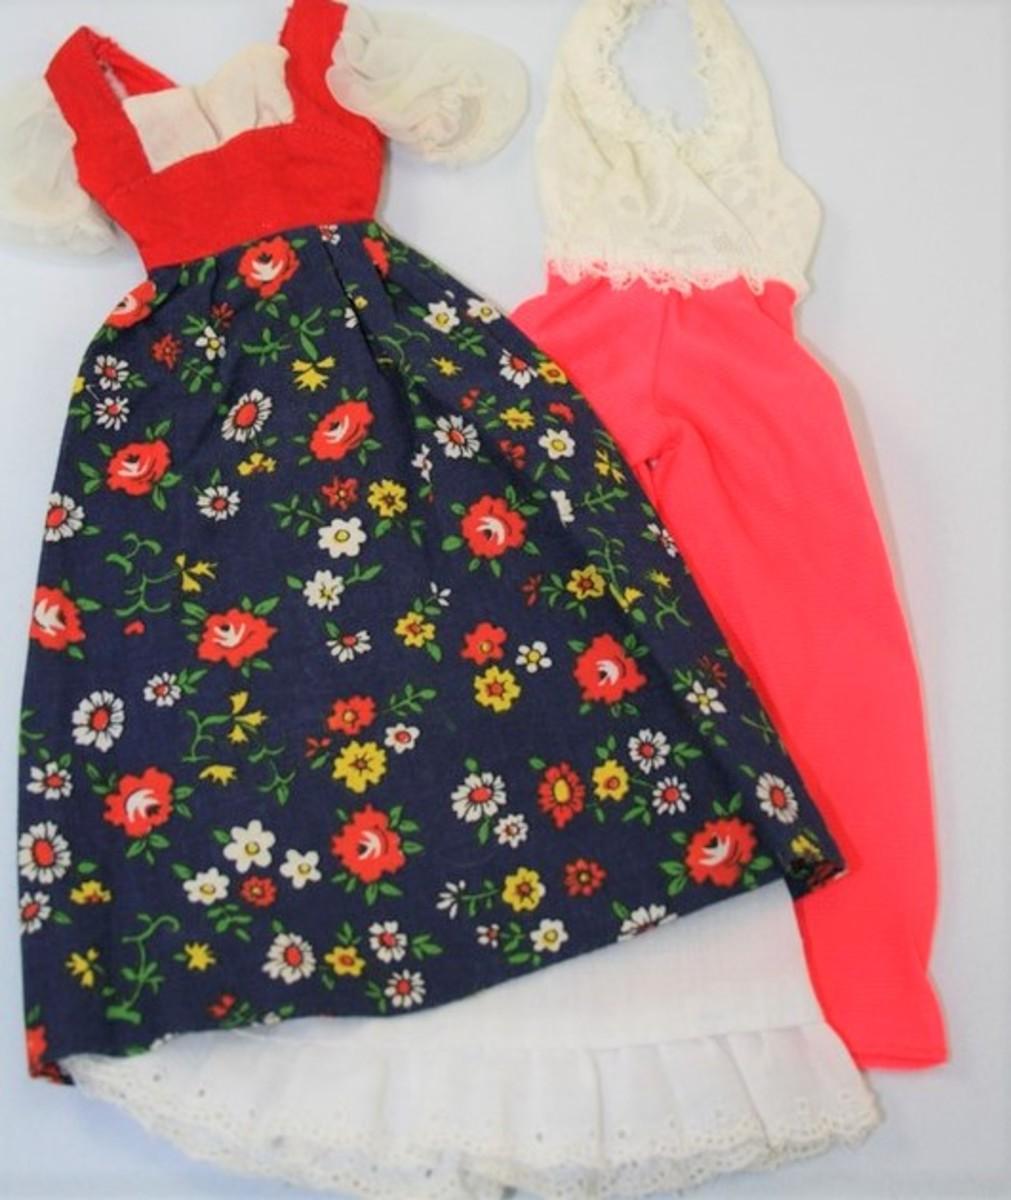 Barbie fashion #7755